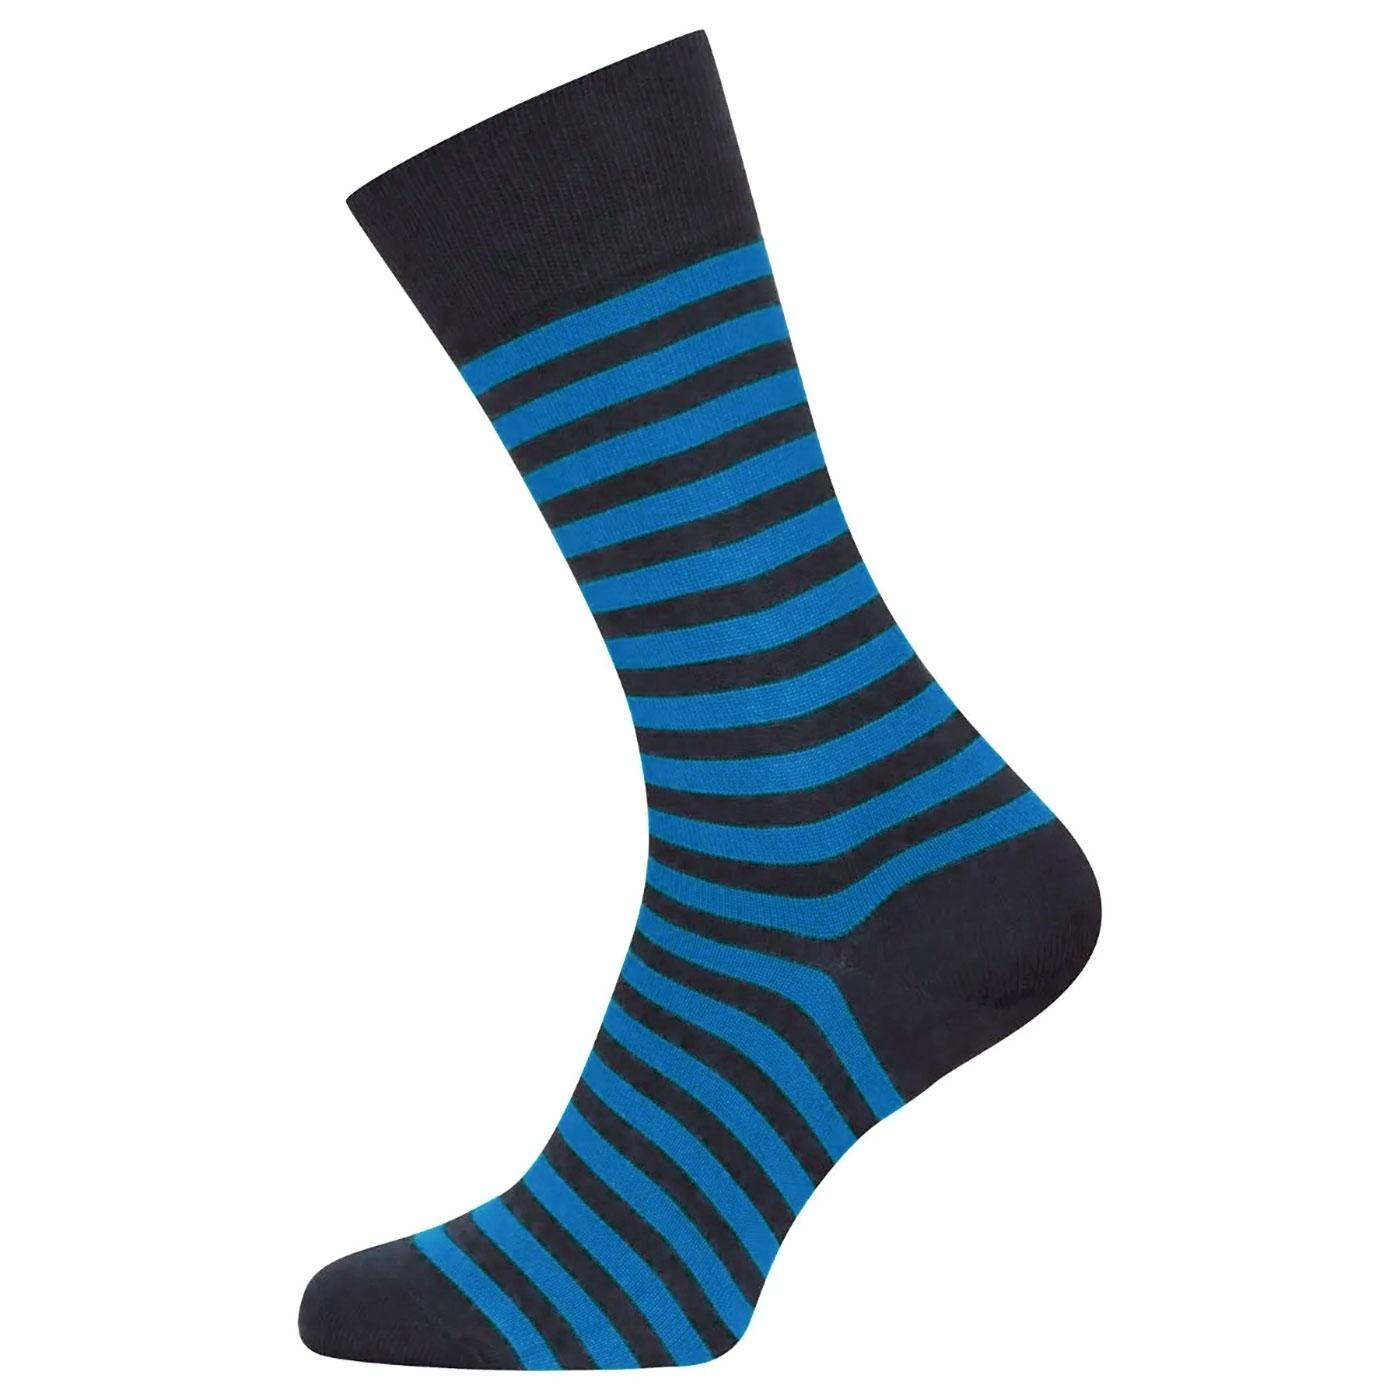 + Hecate JOHN SMEDLEY Men's Striped Cotton Socks N